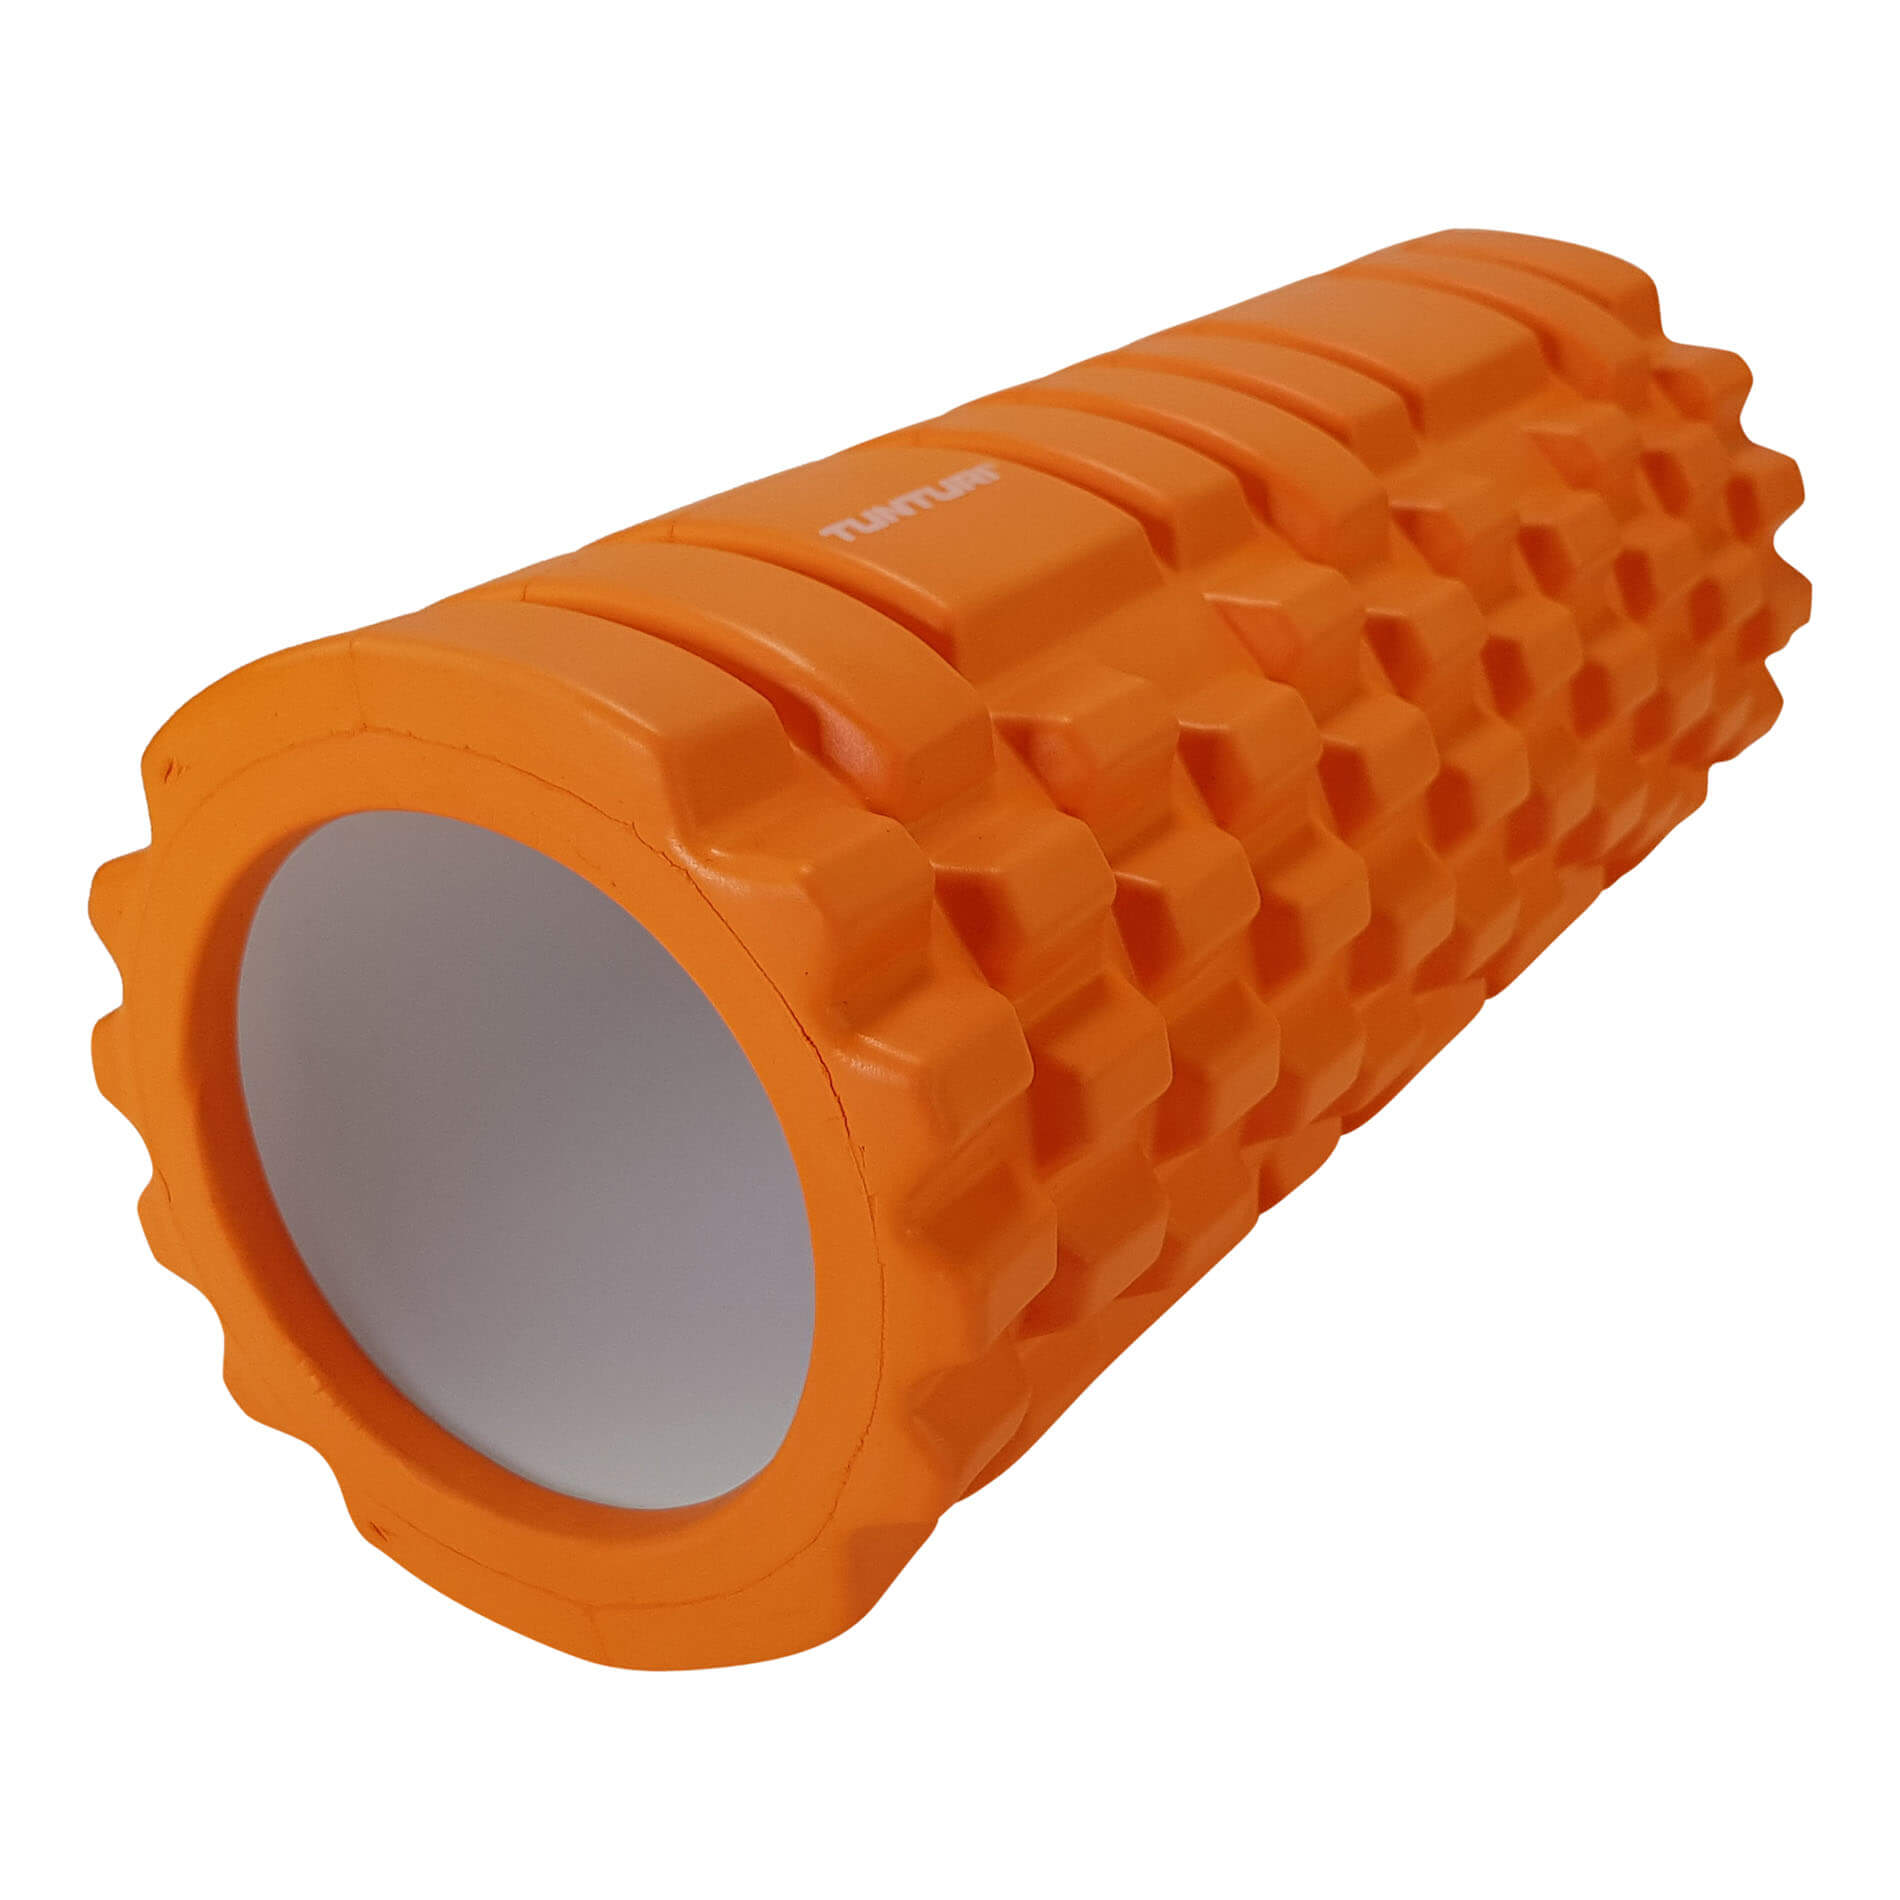 Yoga Grid Foam Roller Massage